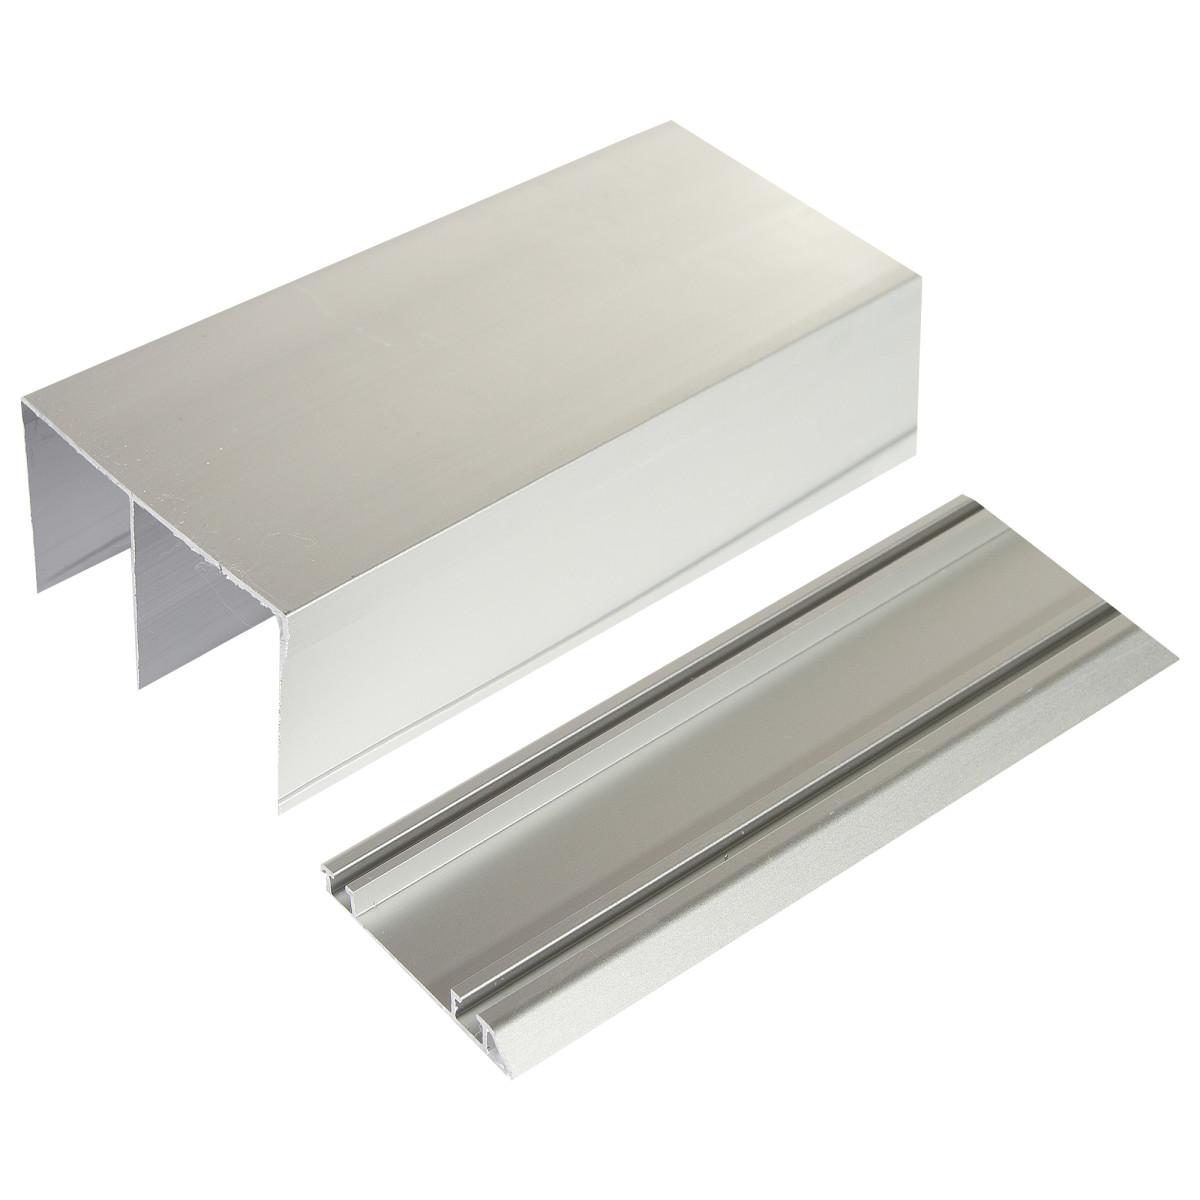 Комплект направляющих 1183 мм для шкафа 1215 мм цвет серебро